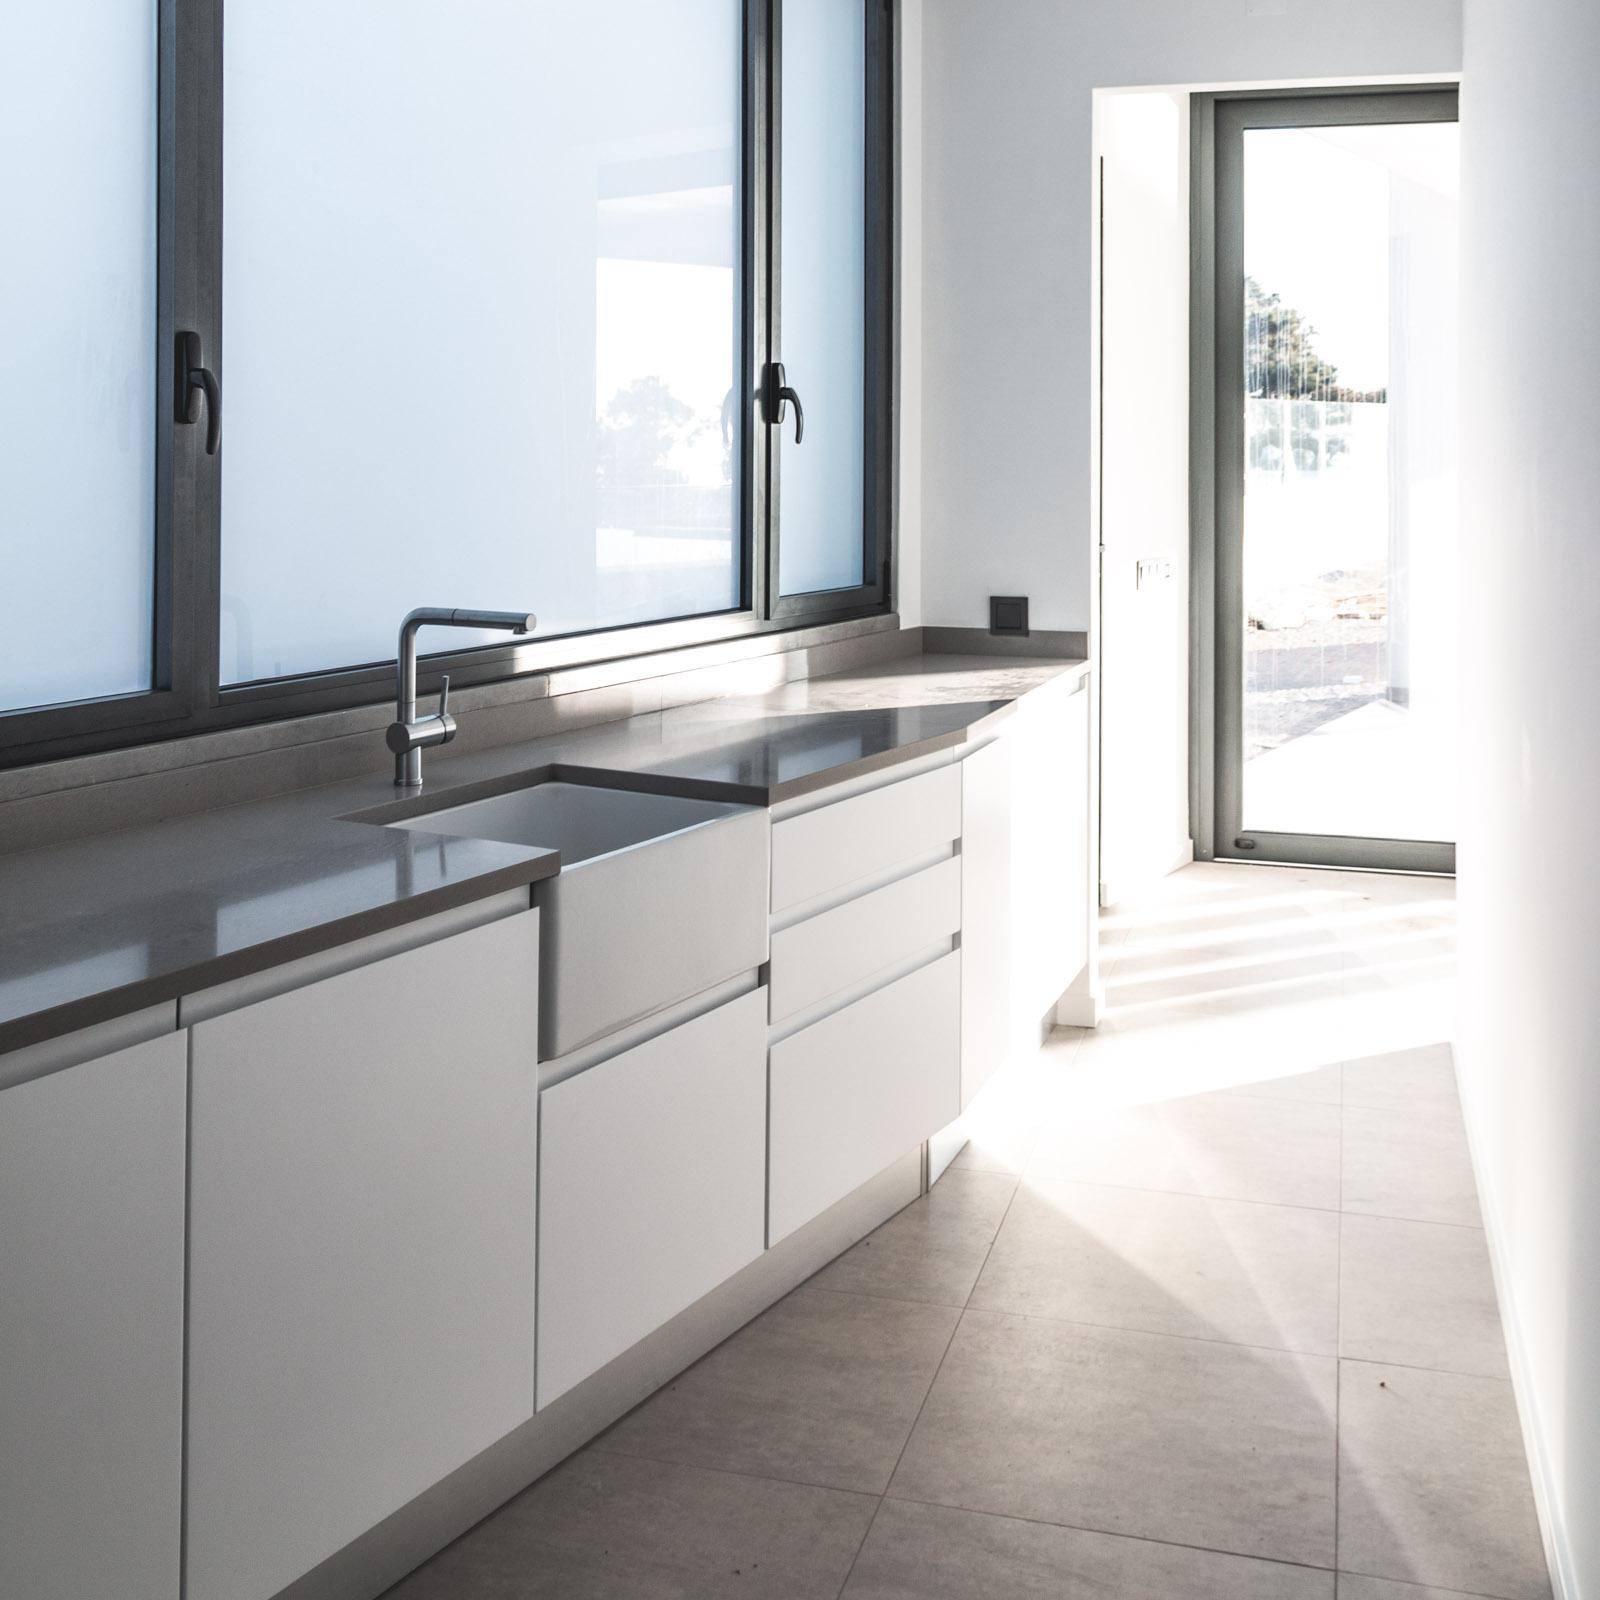 Back kitchen with ceramic sink